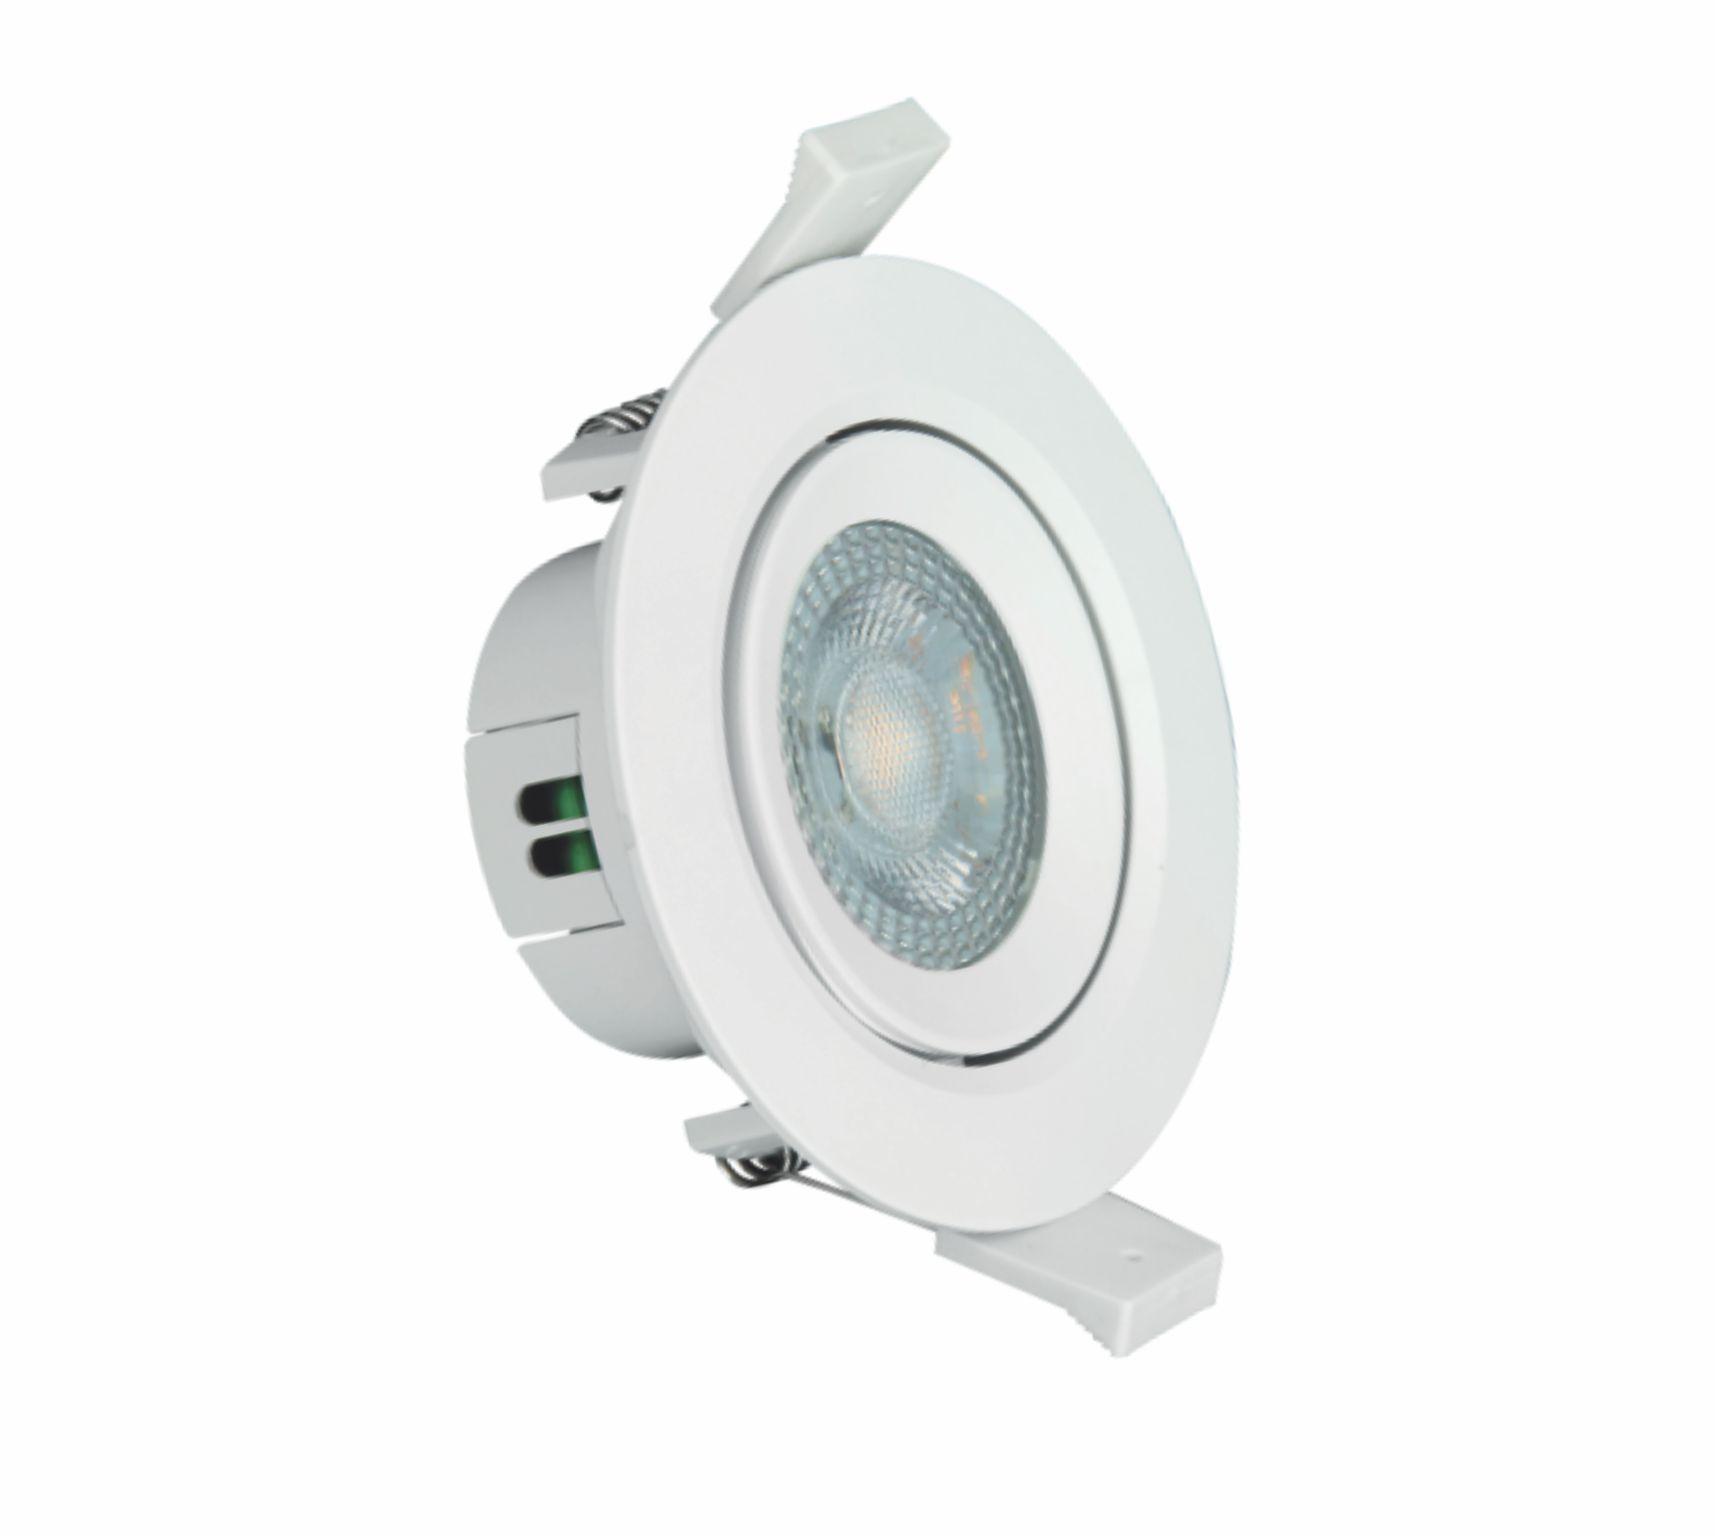 Spot LED Redondo PAR30 12W 3000K Branco AUTOVOLT